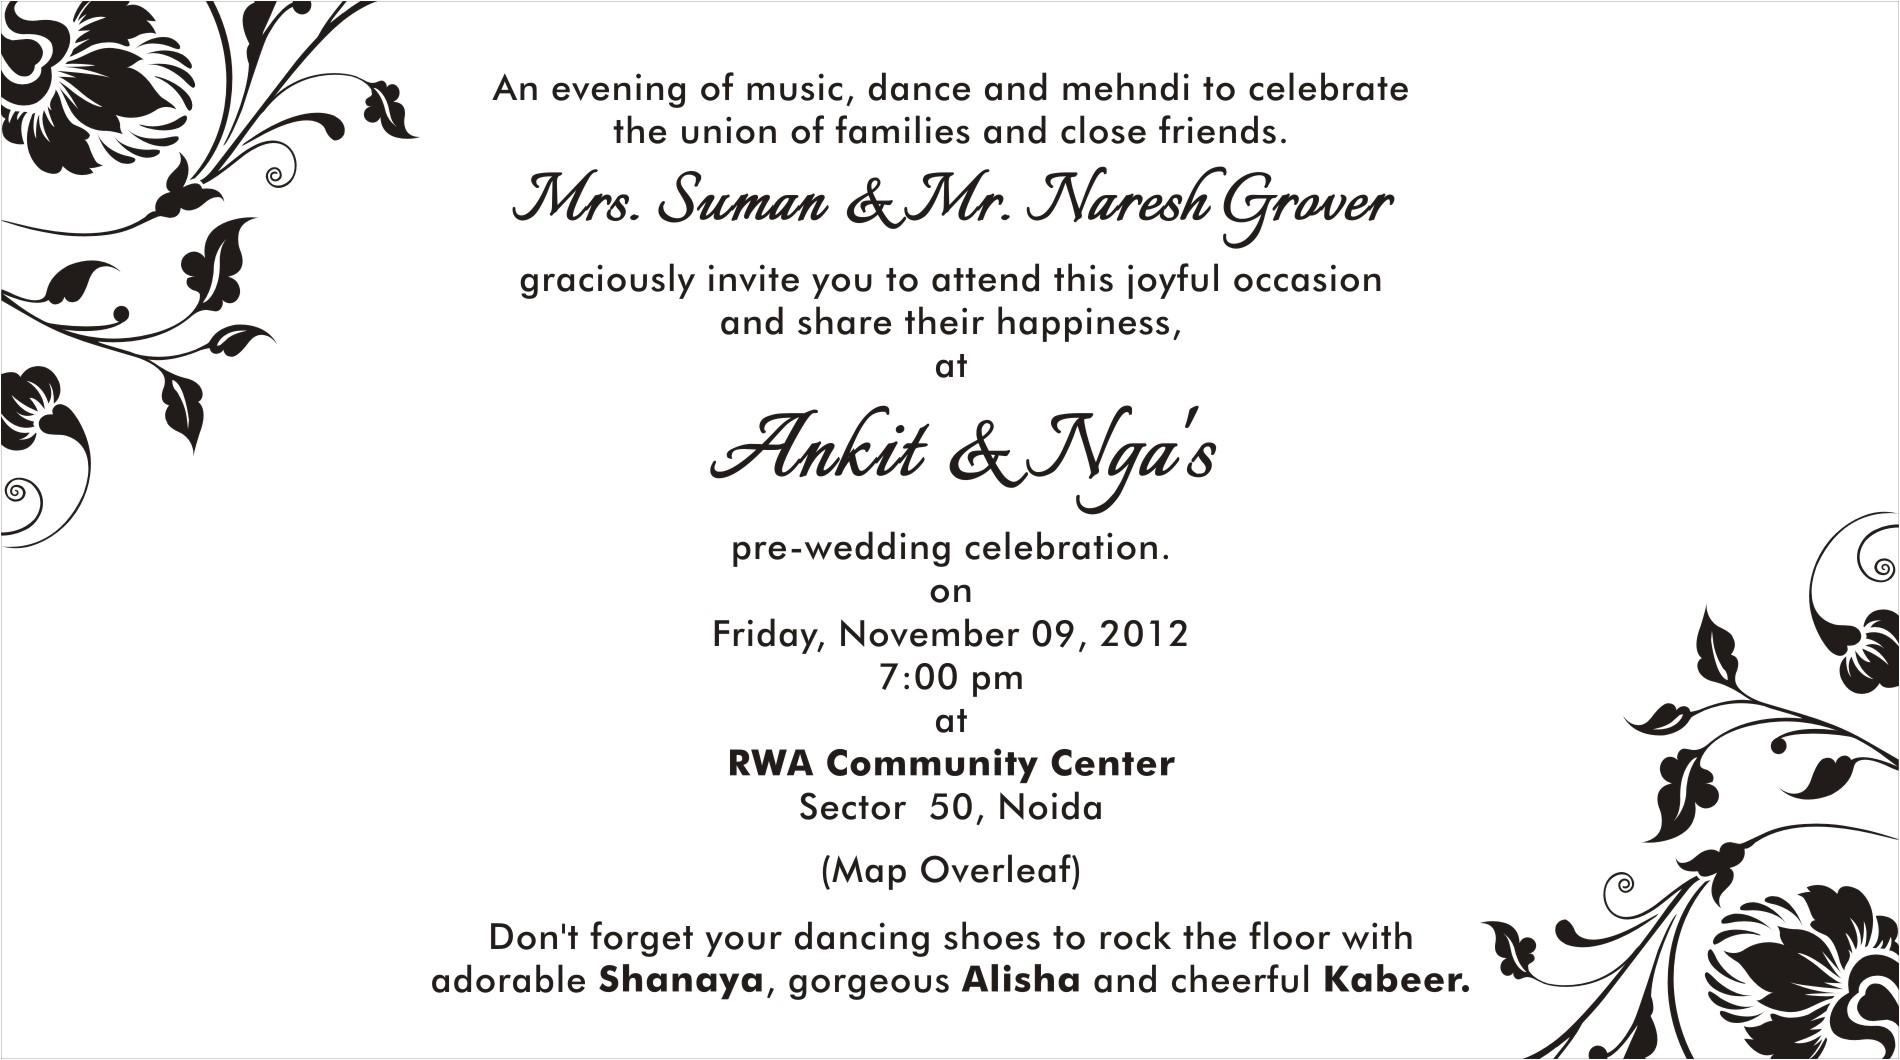 invitations and program details